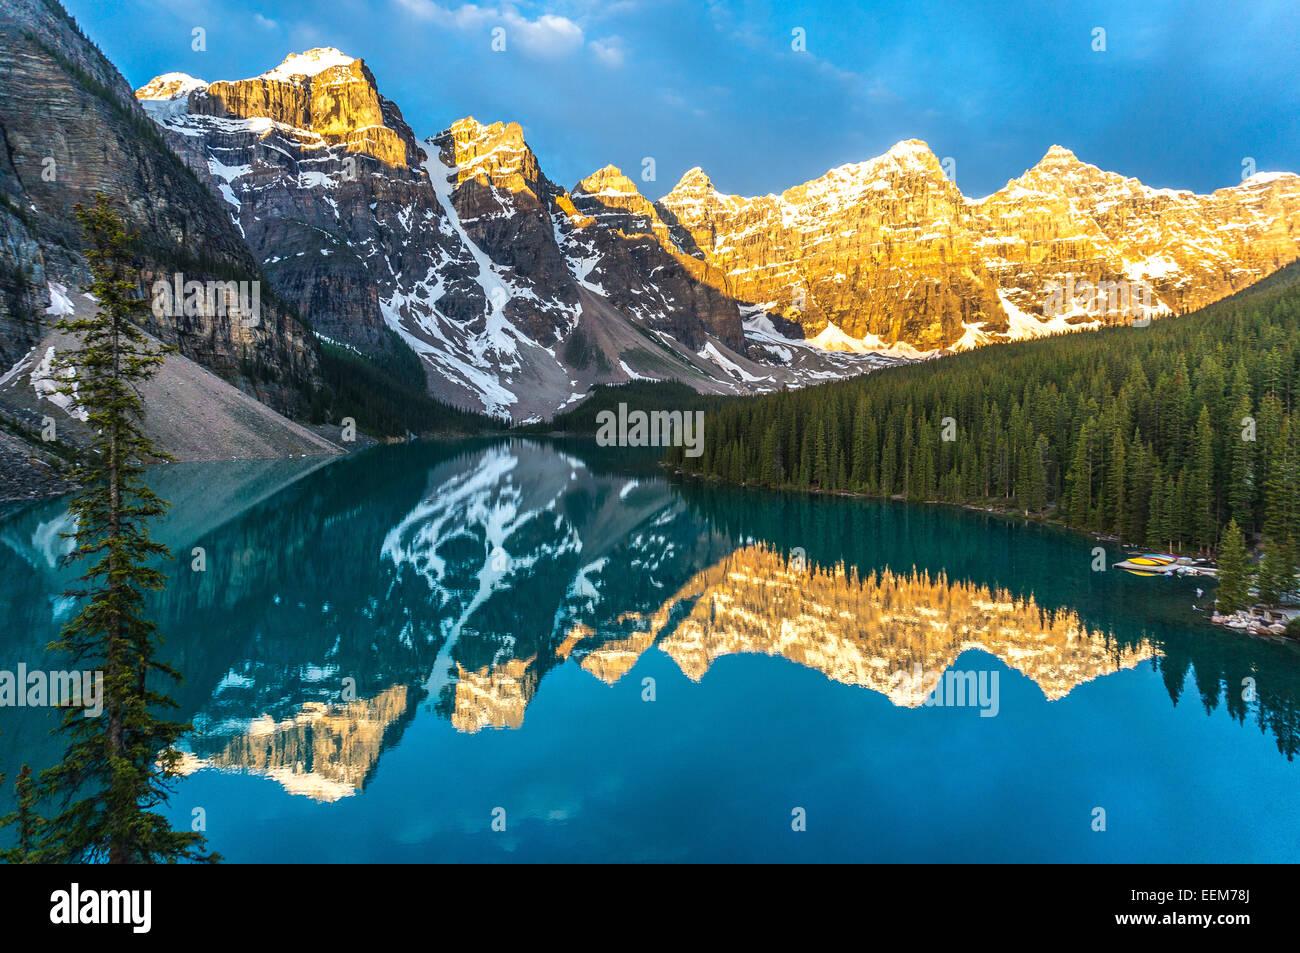 Kanada, Banff Nationalpark, Kanadische Rockies, Bergen reflektiert in ruhiger See bei Sonnenaufgang Stockbild